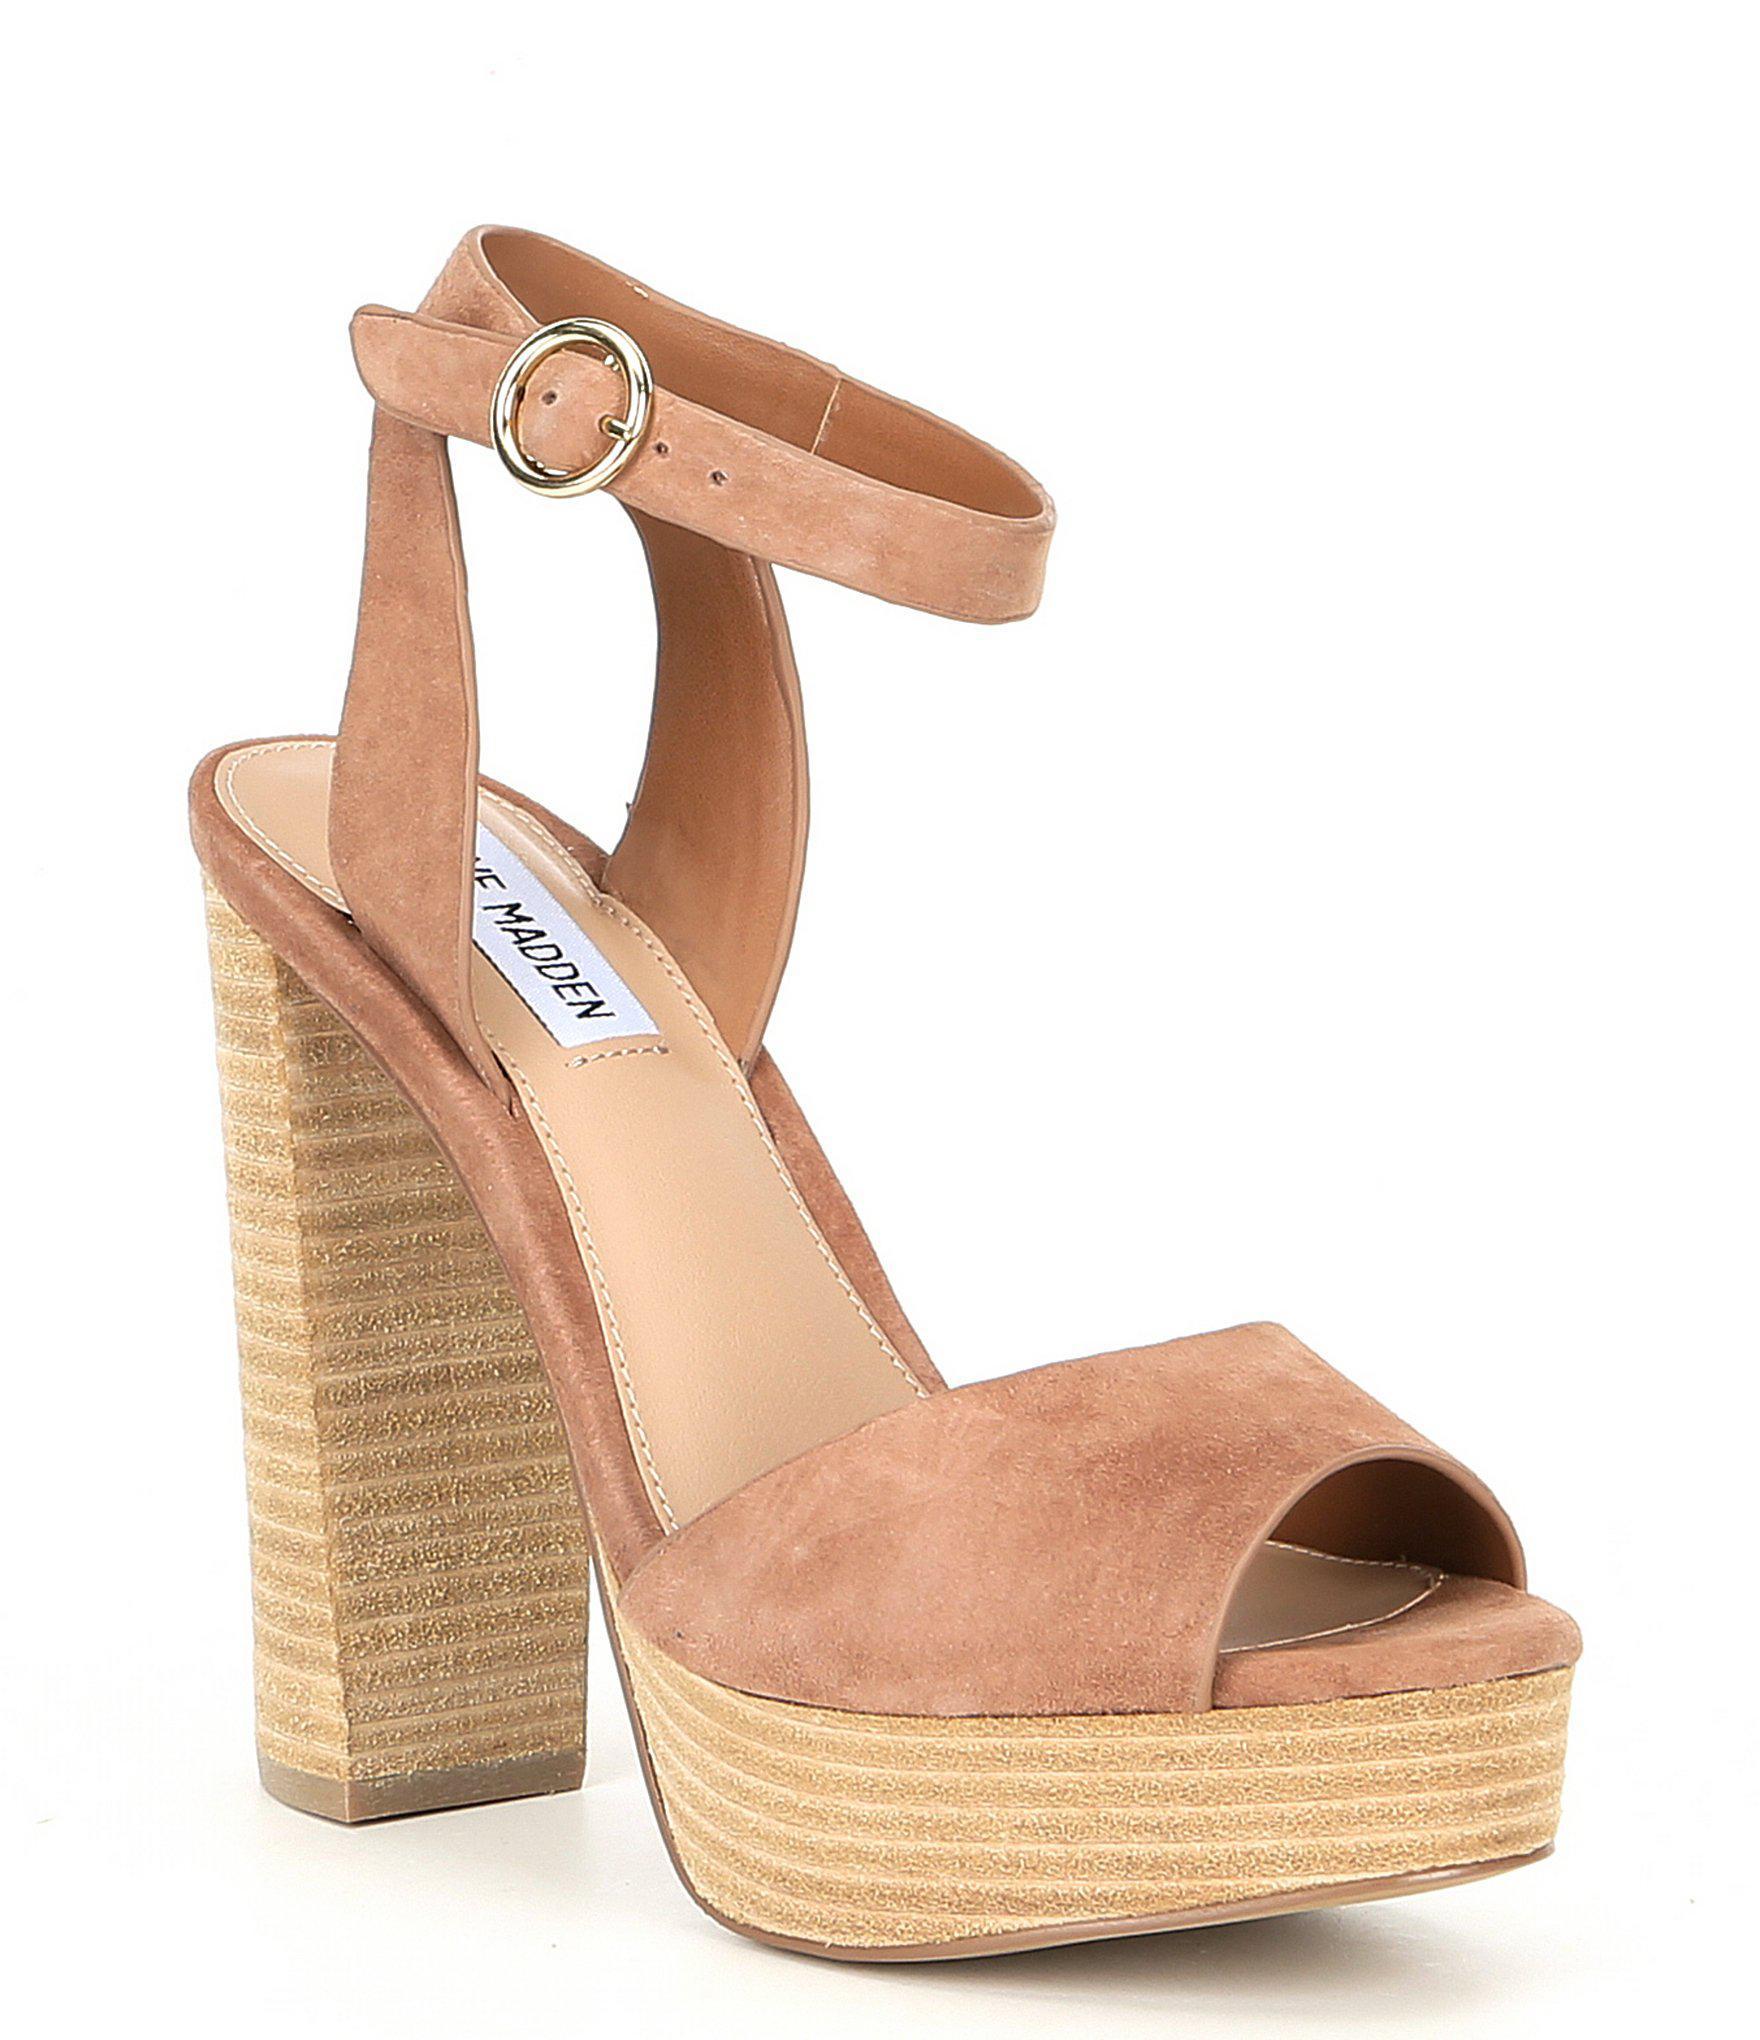 6024c45a5675 Lyst - Steve Madden Madeline Suede Block Heel Platform Sandals in Brown